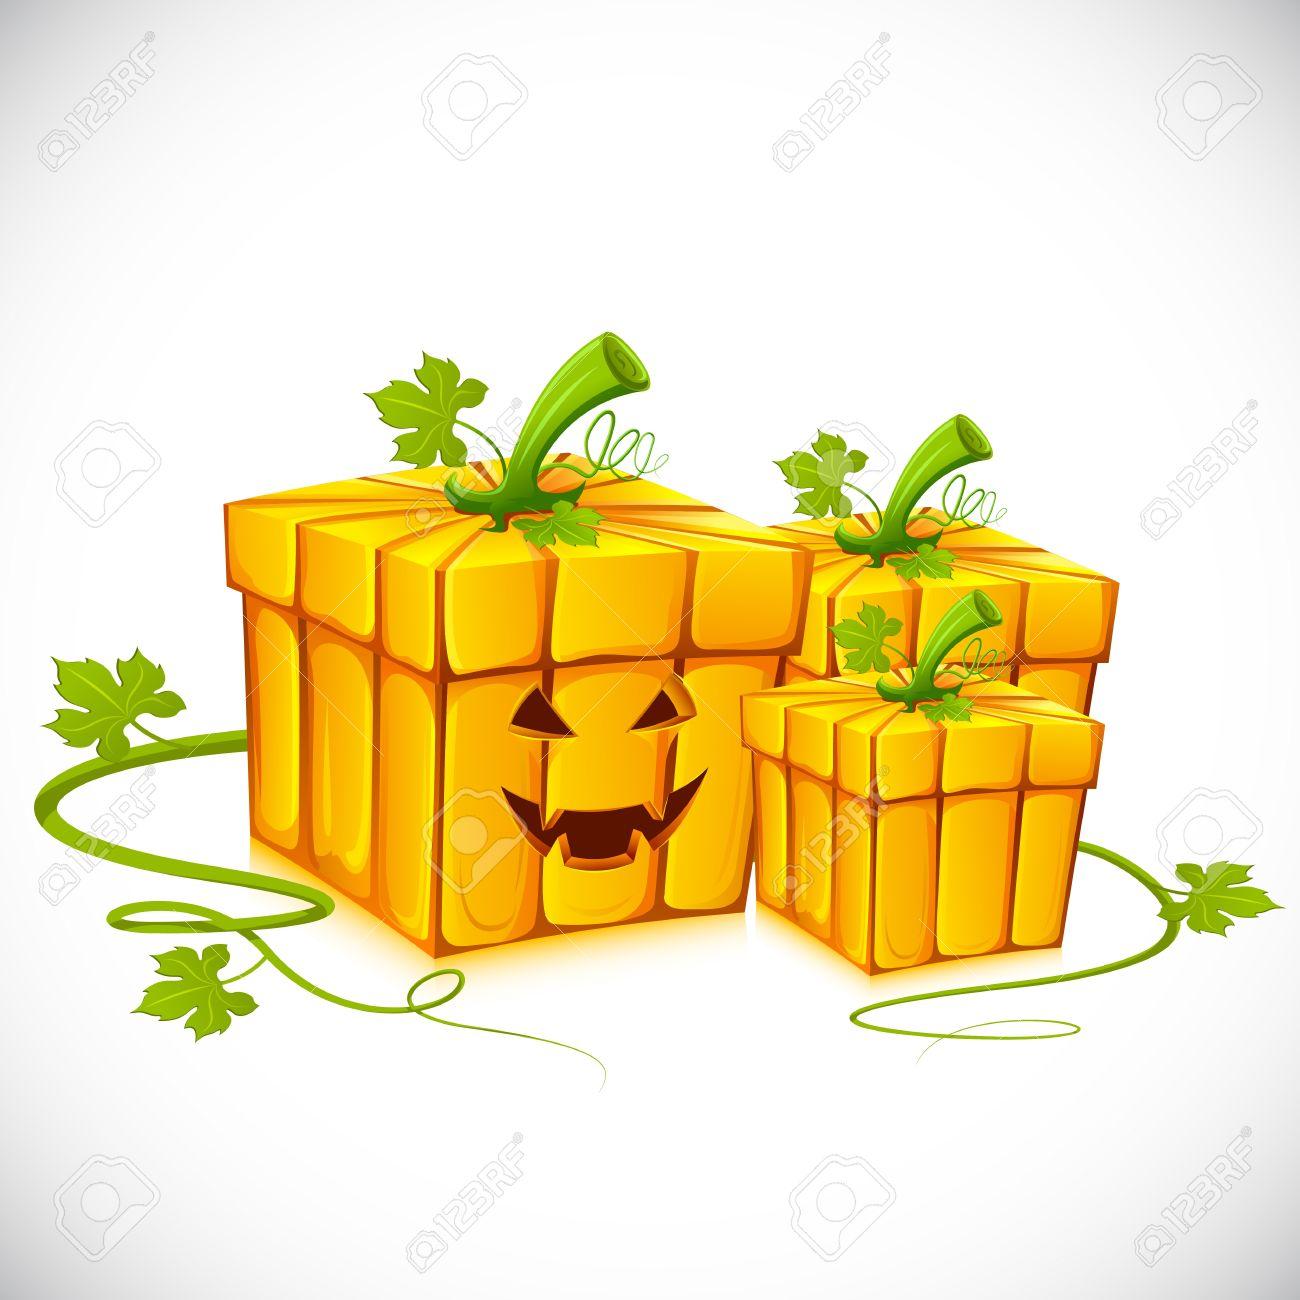 Illustration Of Pumpkin Shape Gift Box For Halloween Royalty Free.